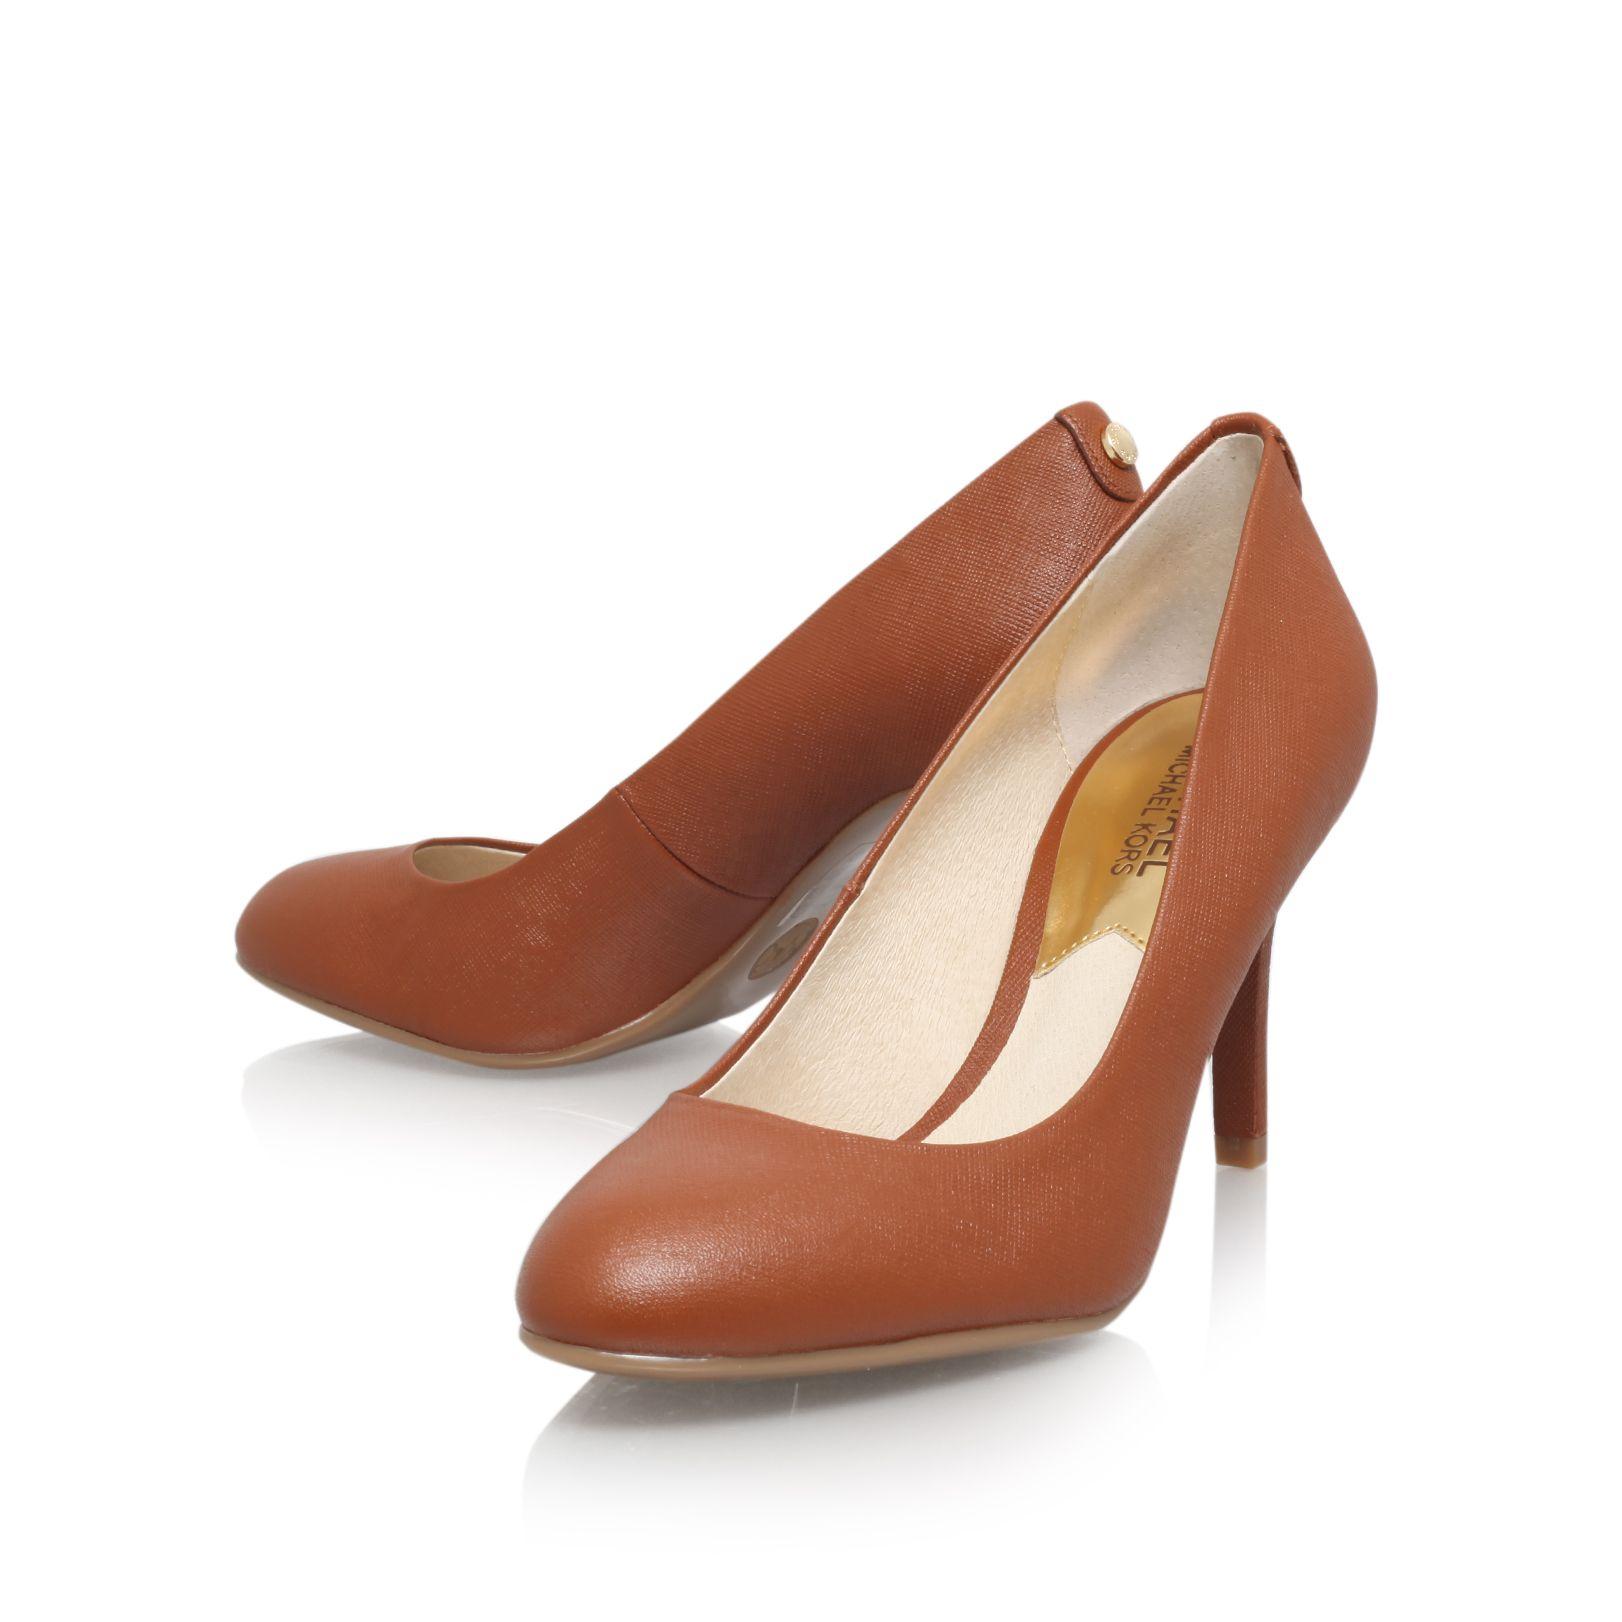 michael kors mk flex high heel court shoes in brown lyst. Black Bedroom Furniture Sets. Home Design Ideas